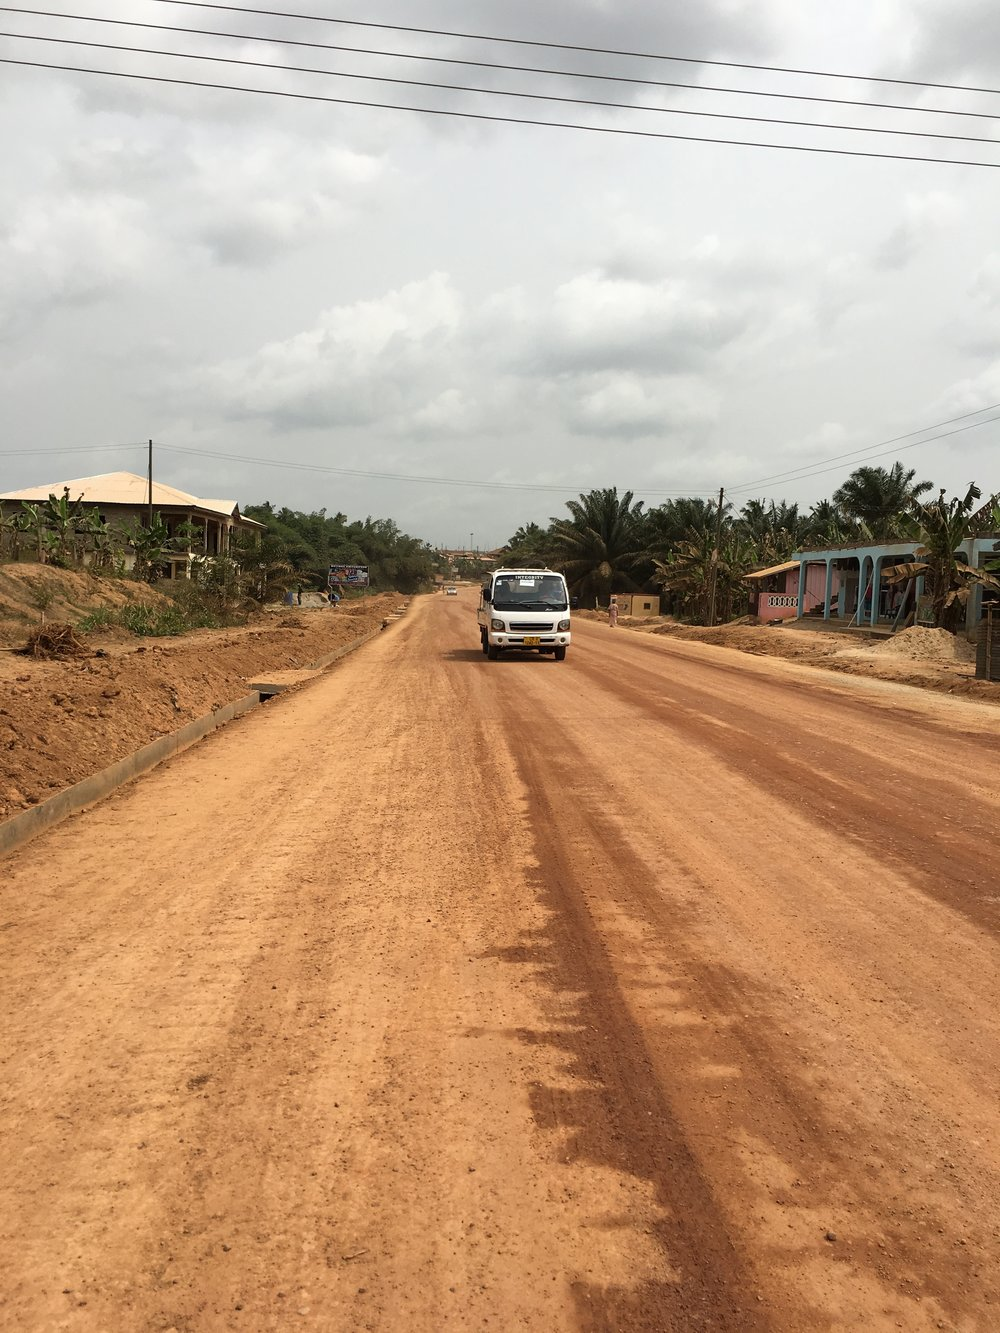 streets in Ghana